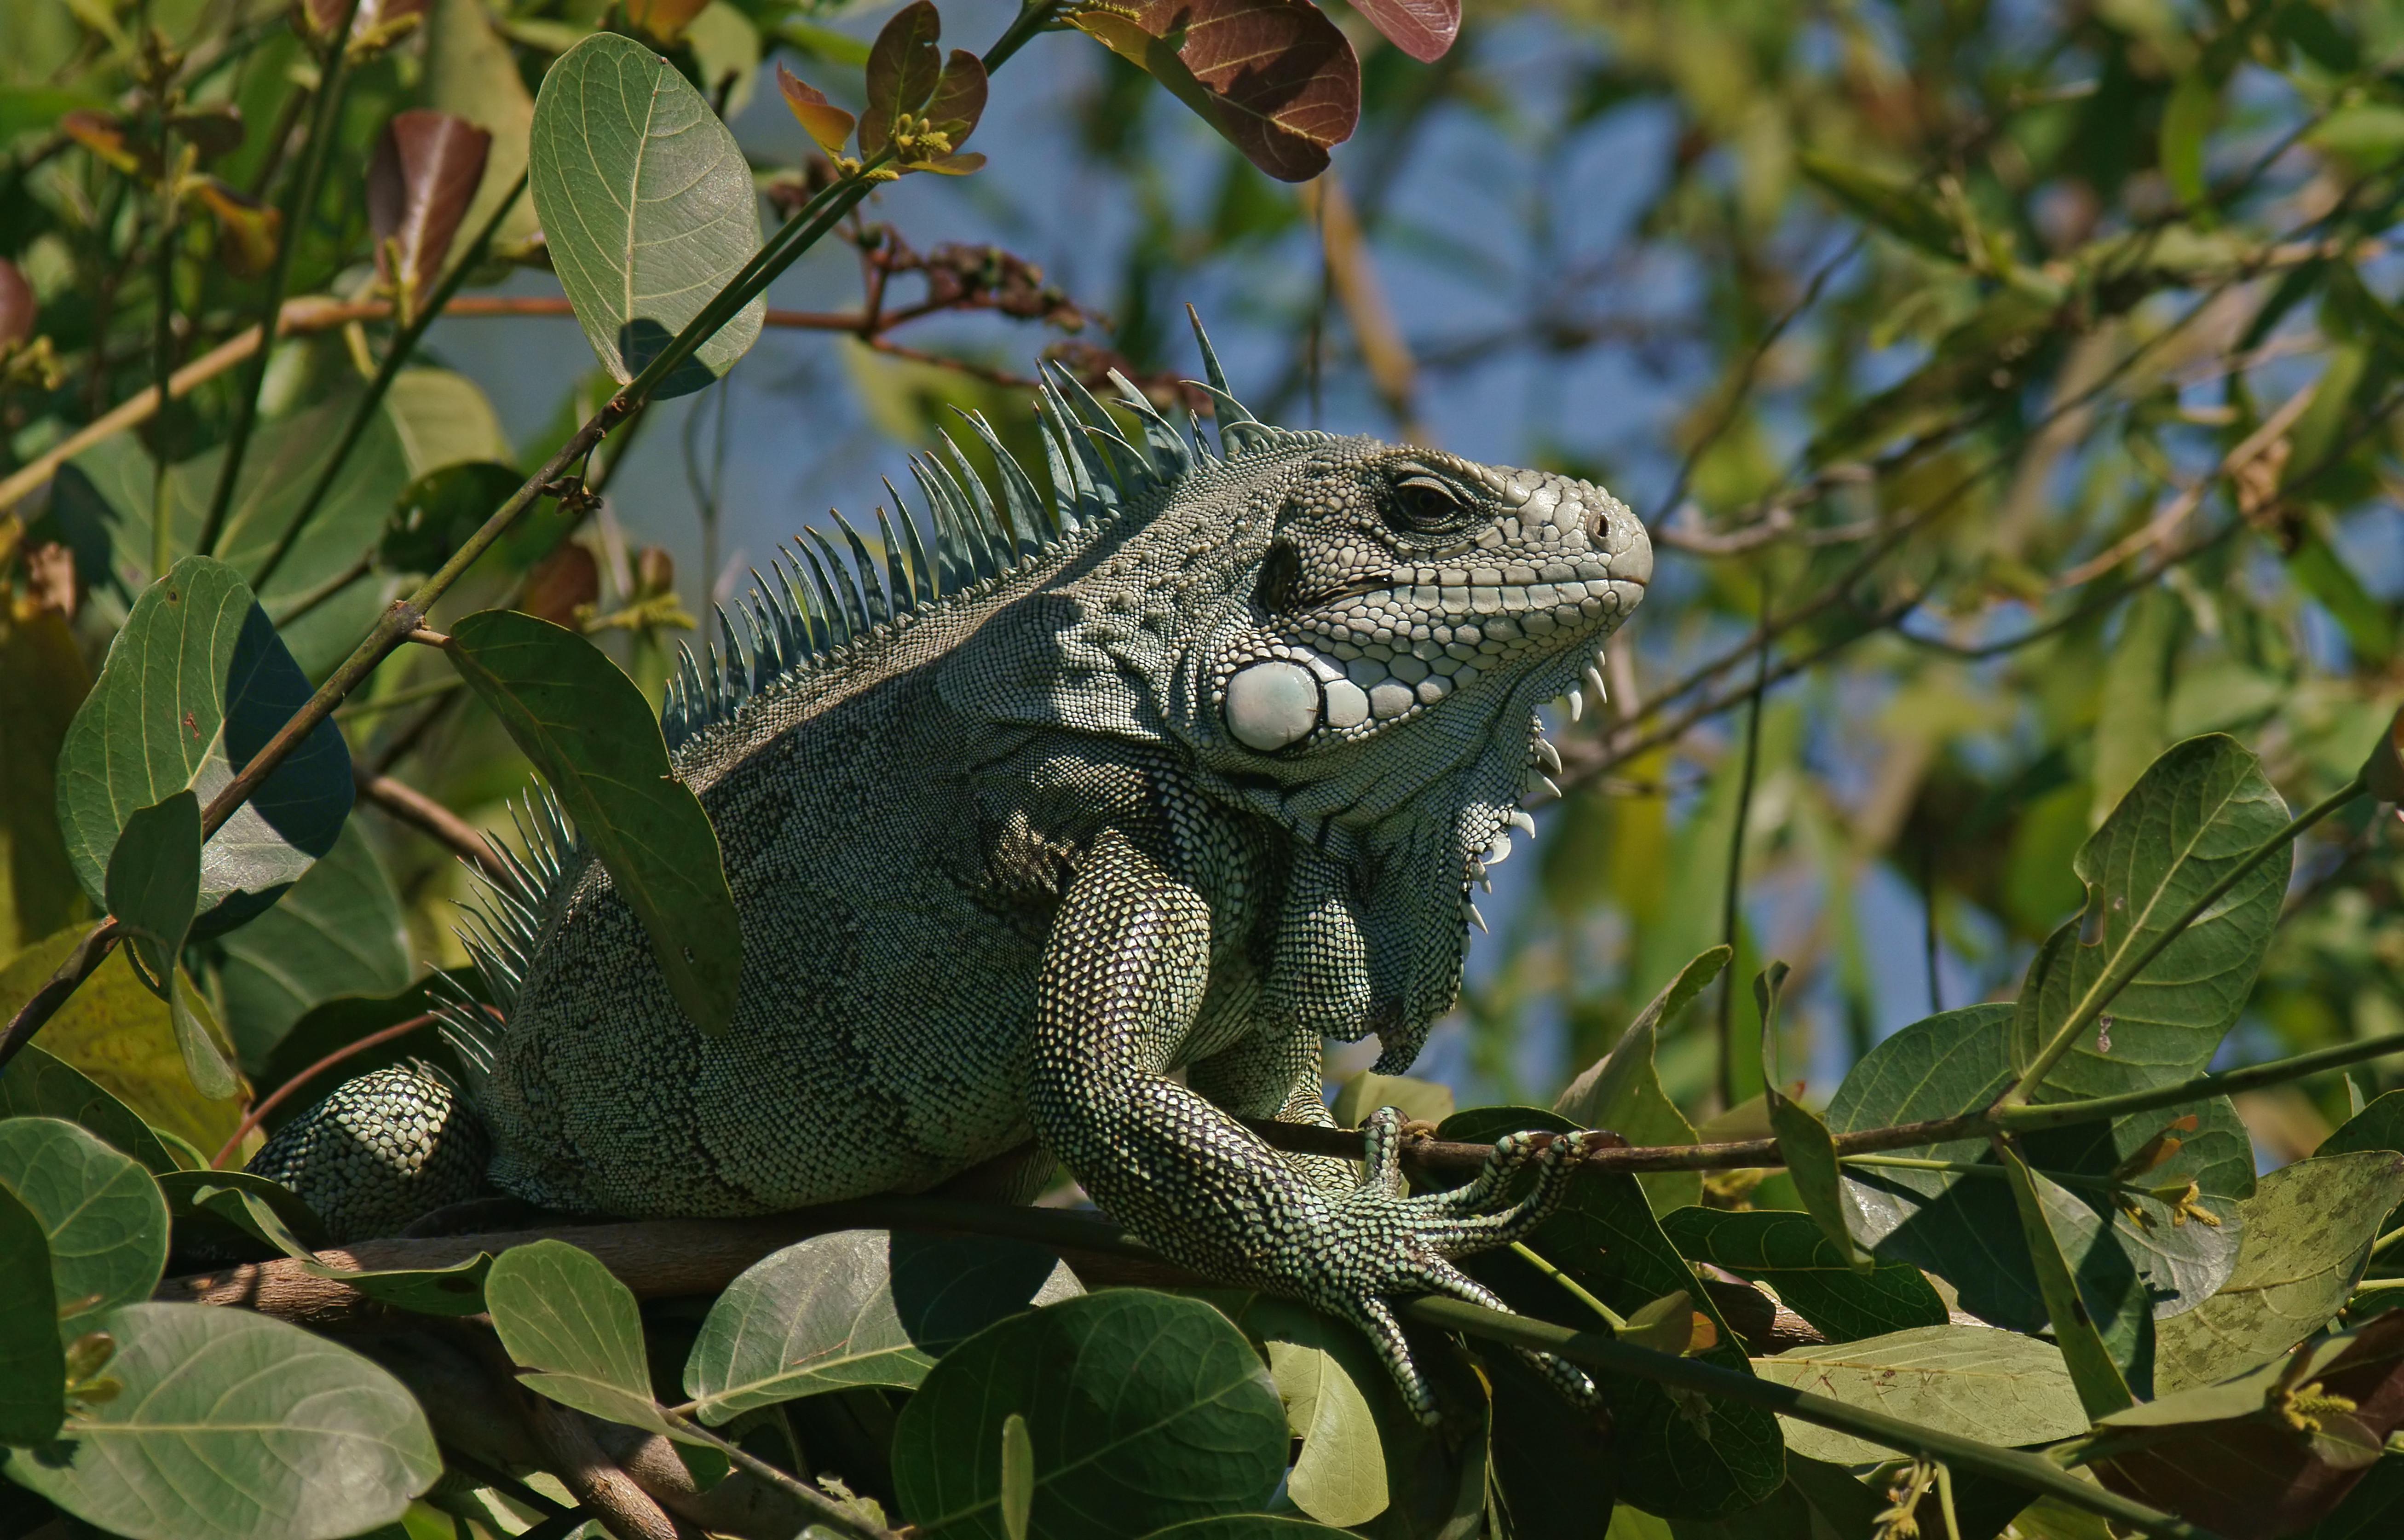 Green iguana (Iguana iguana) in the tree, Pantanal, Brazil